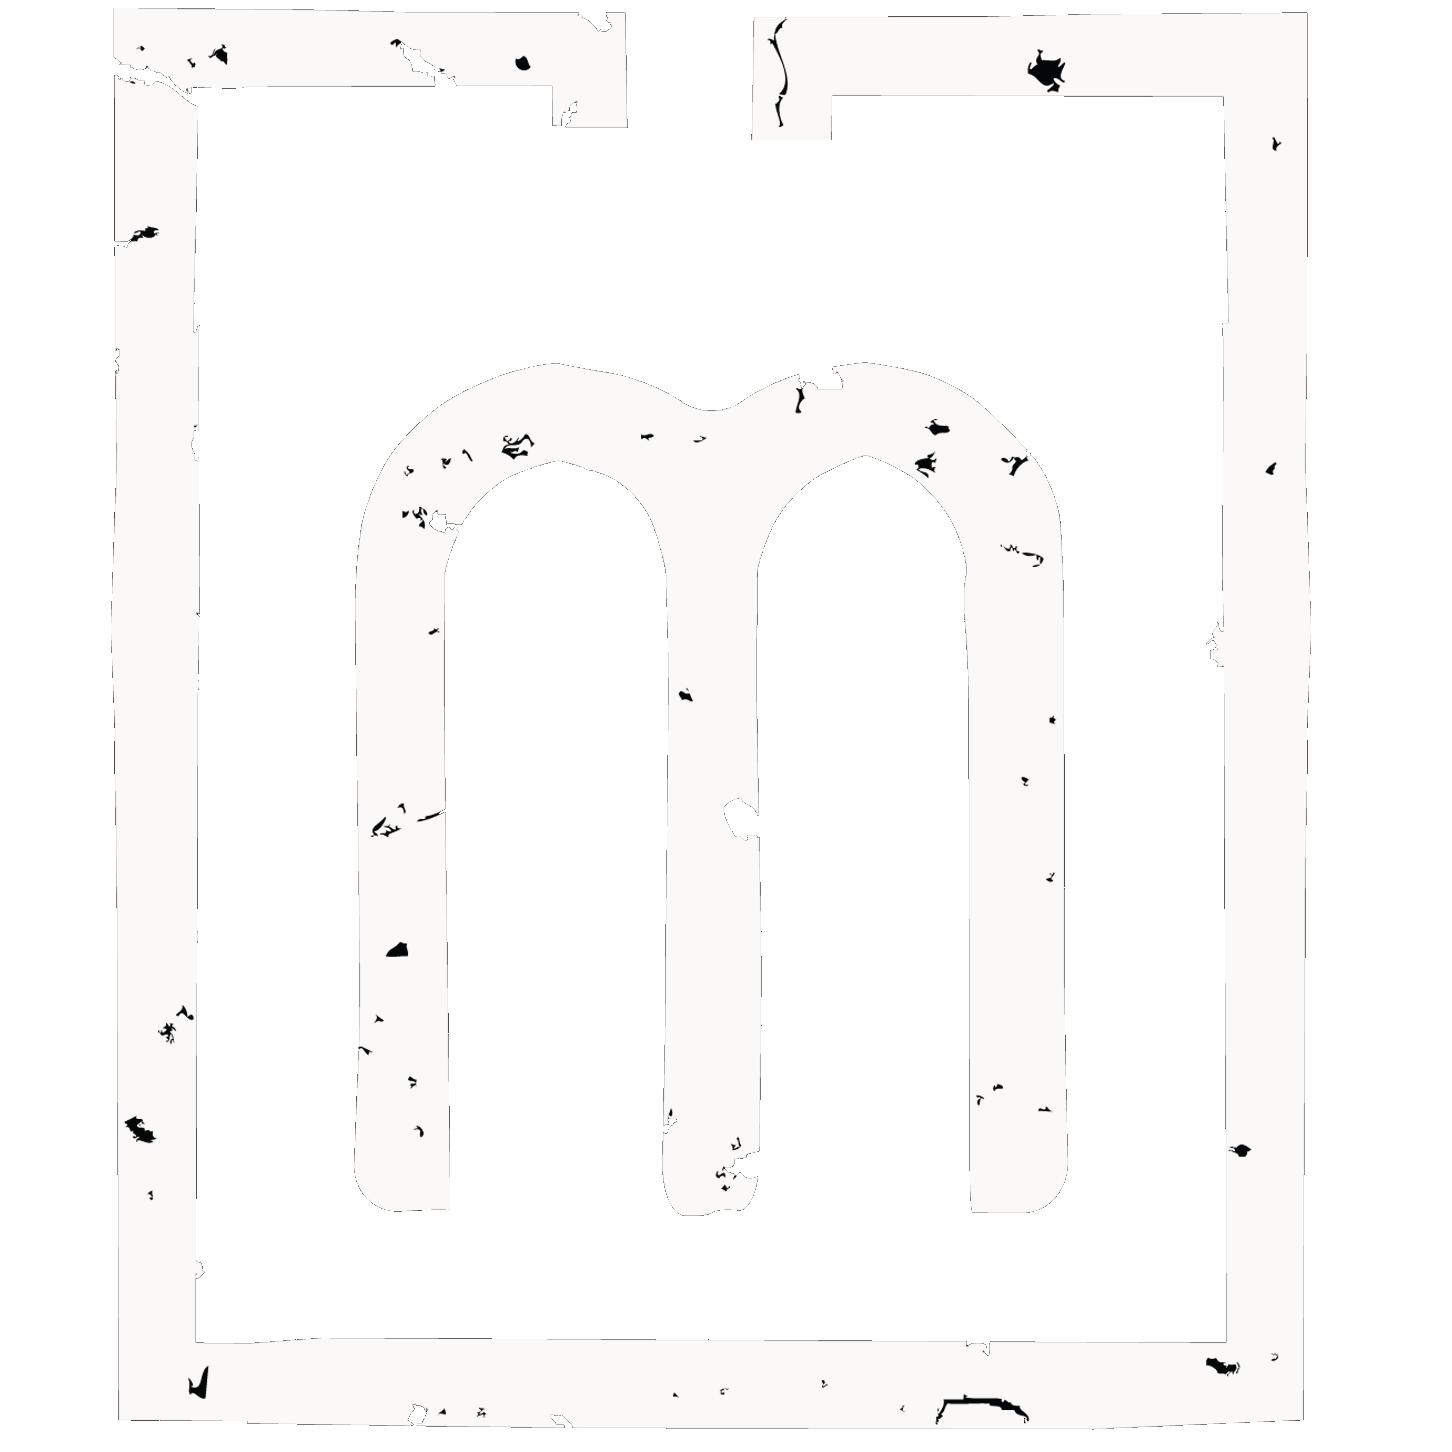 Maçaroca